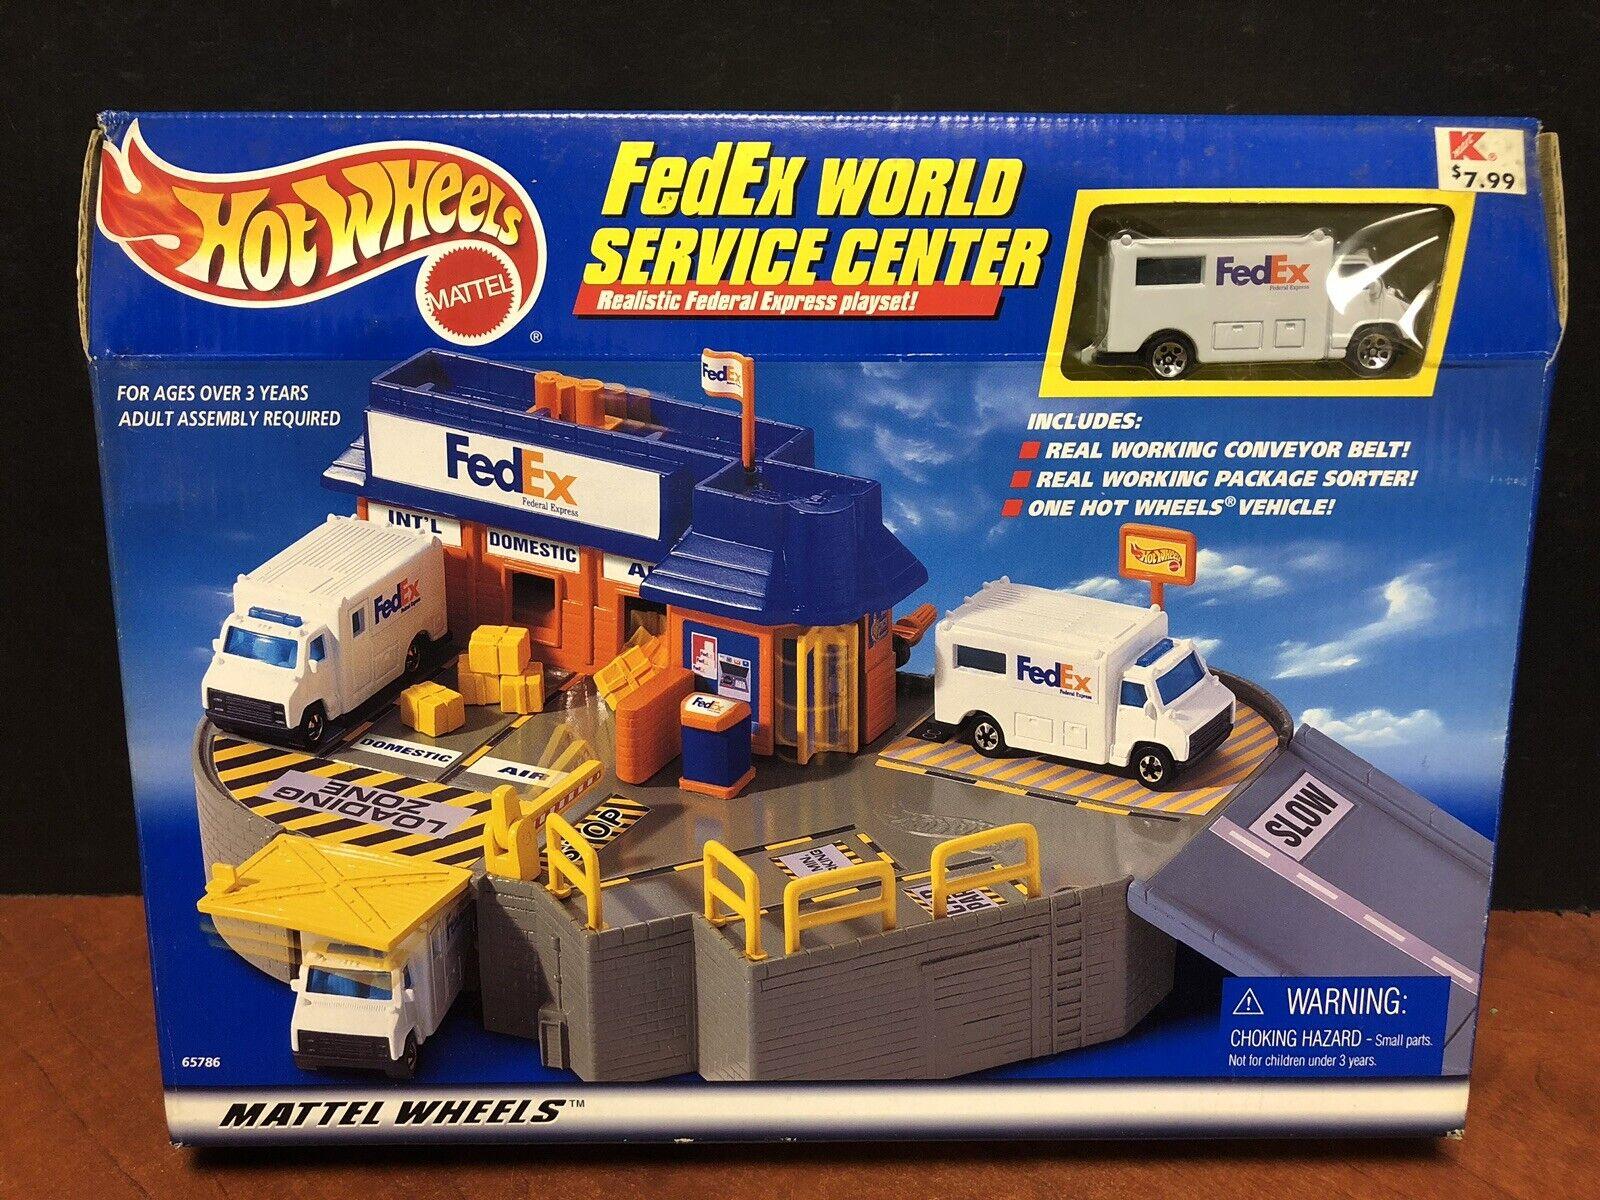 Hot Wheels 1998 Fedex World Service Center Playset Factory Sealed Dela1311